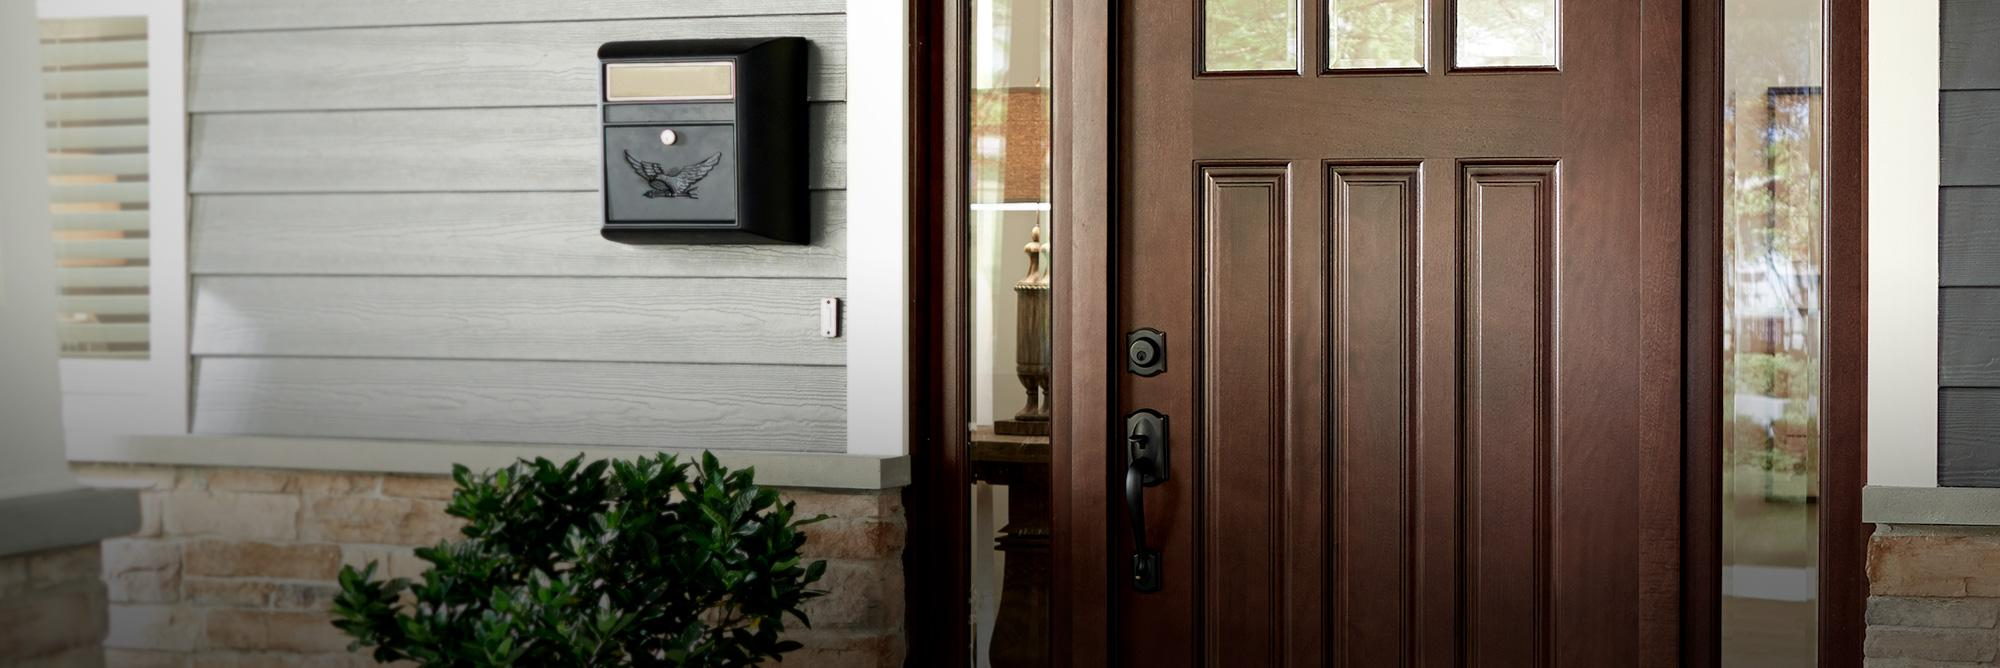 Victoria Exterior Doors & Installation Services